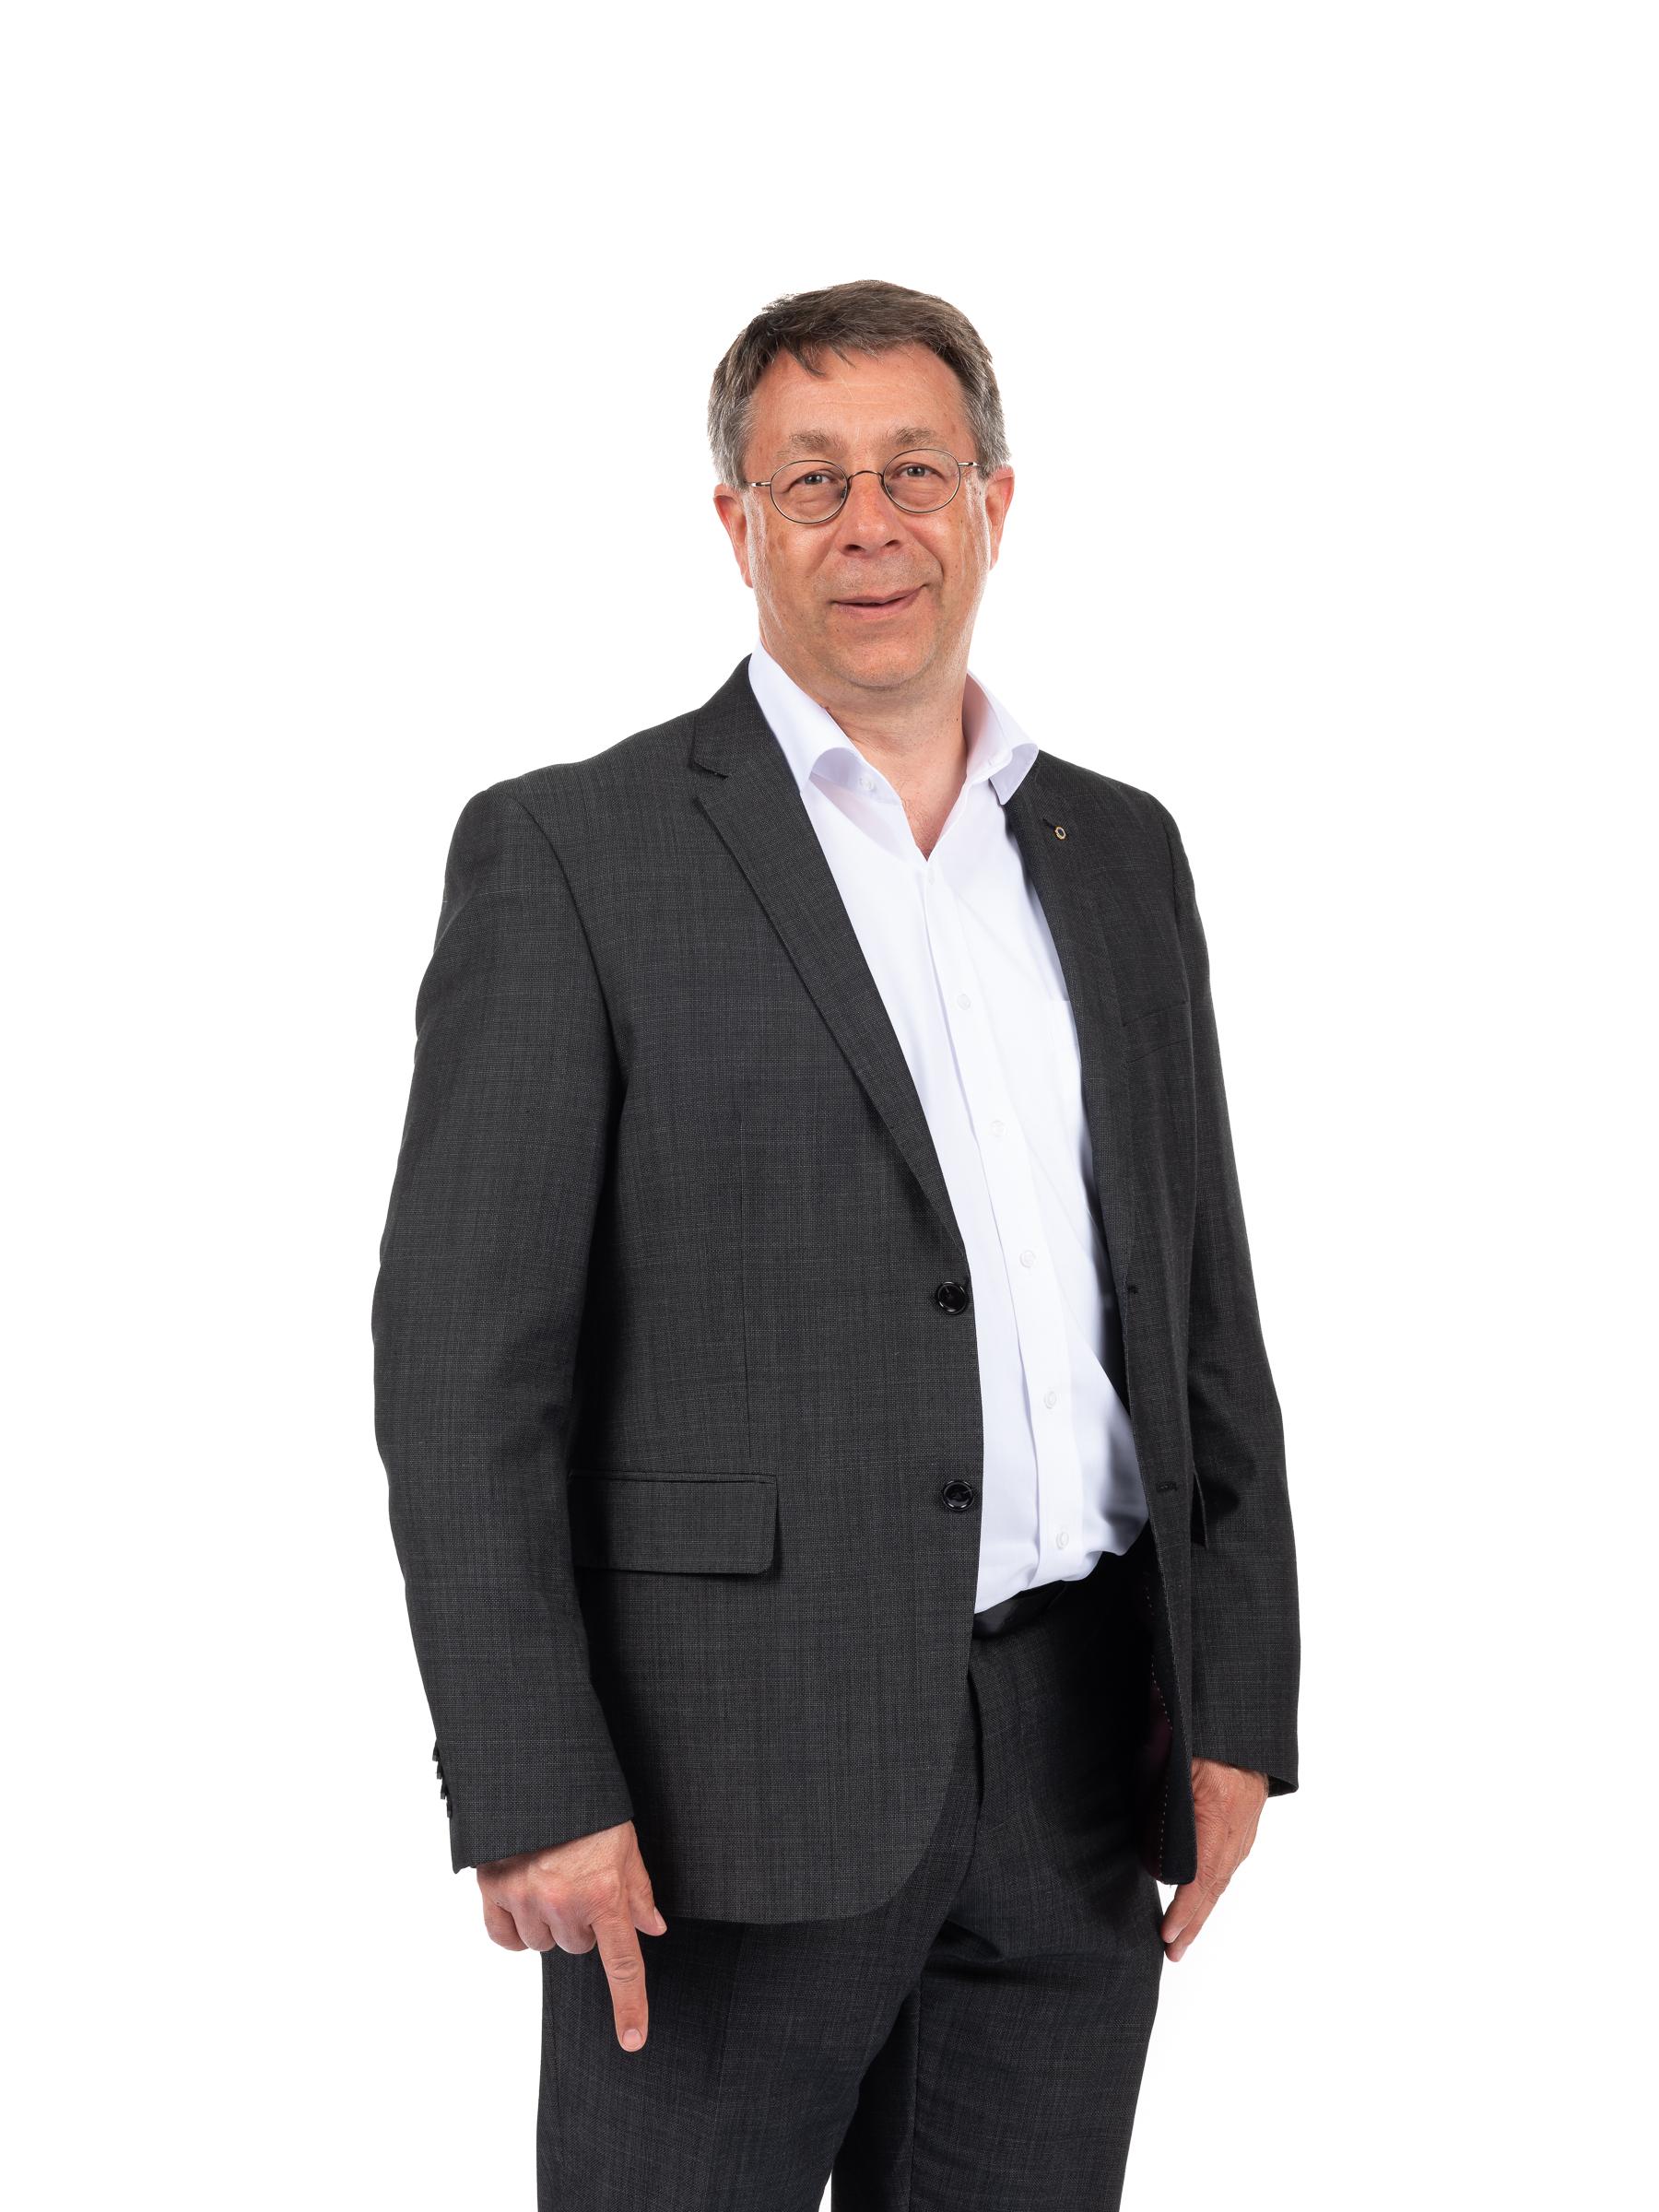 Stéphane Picard